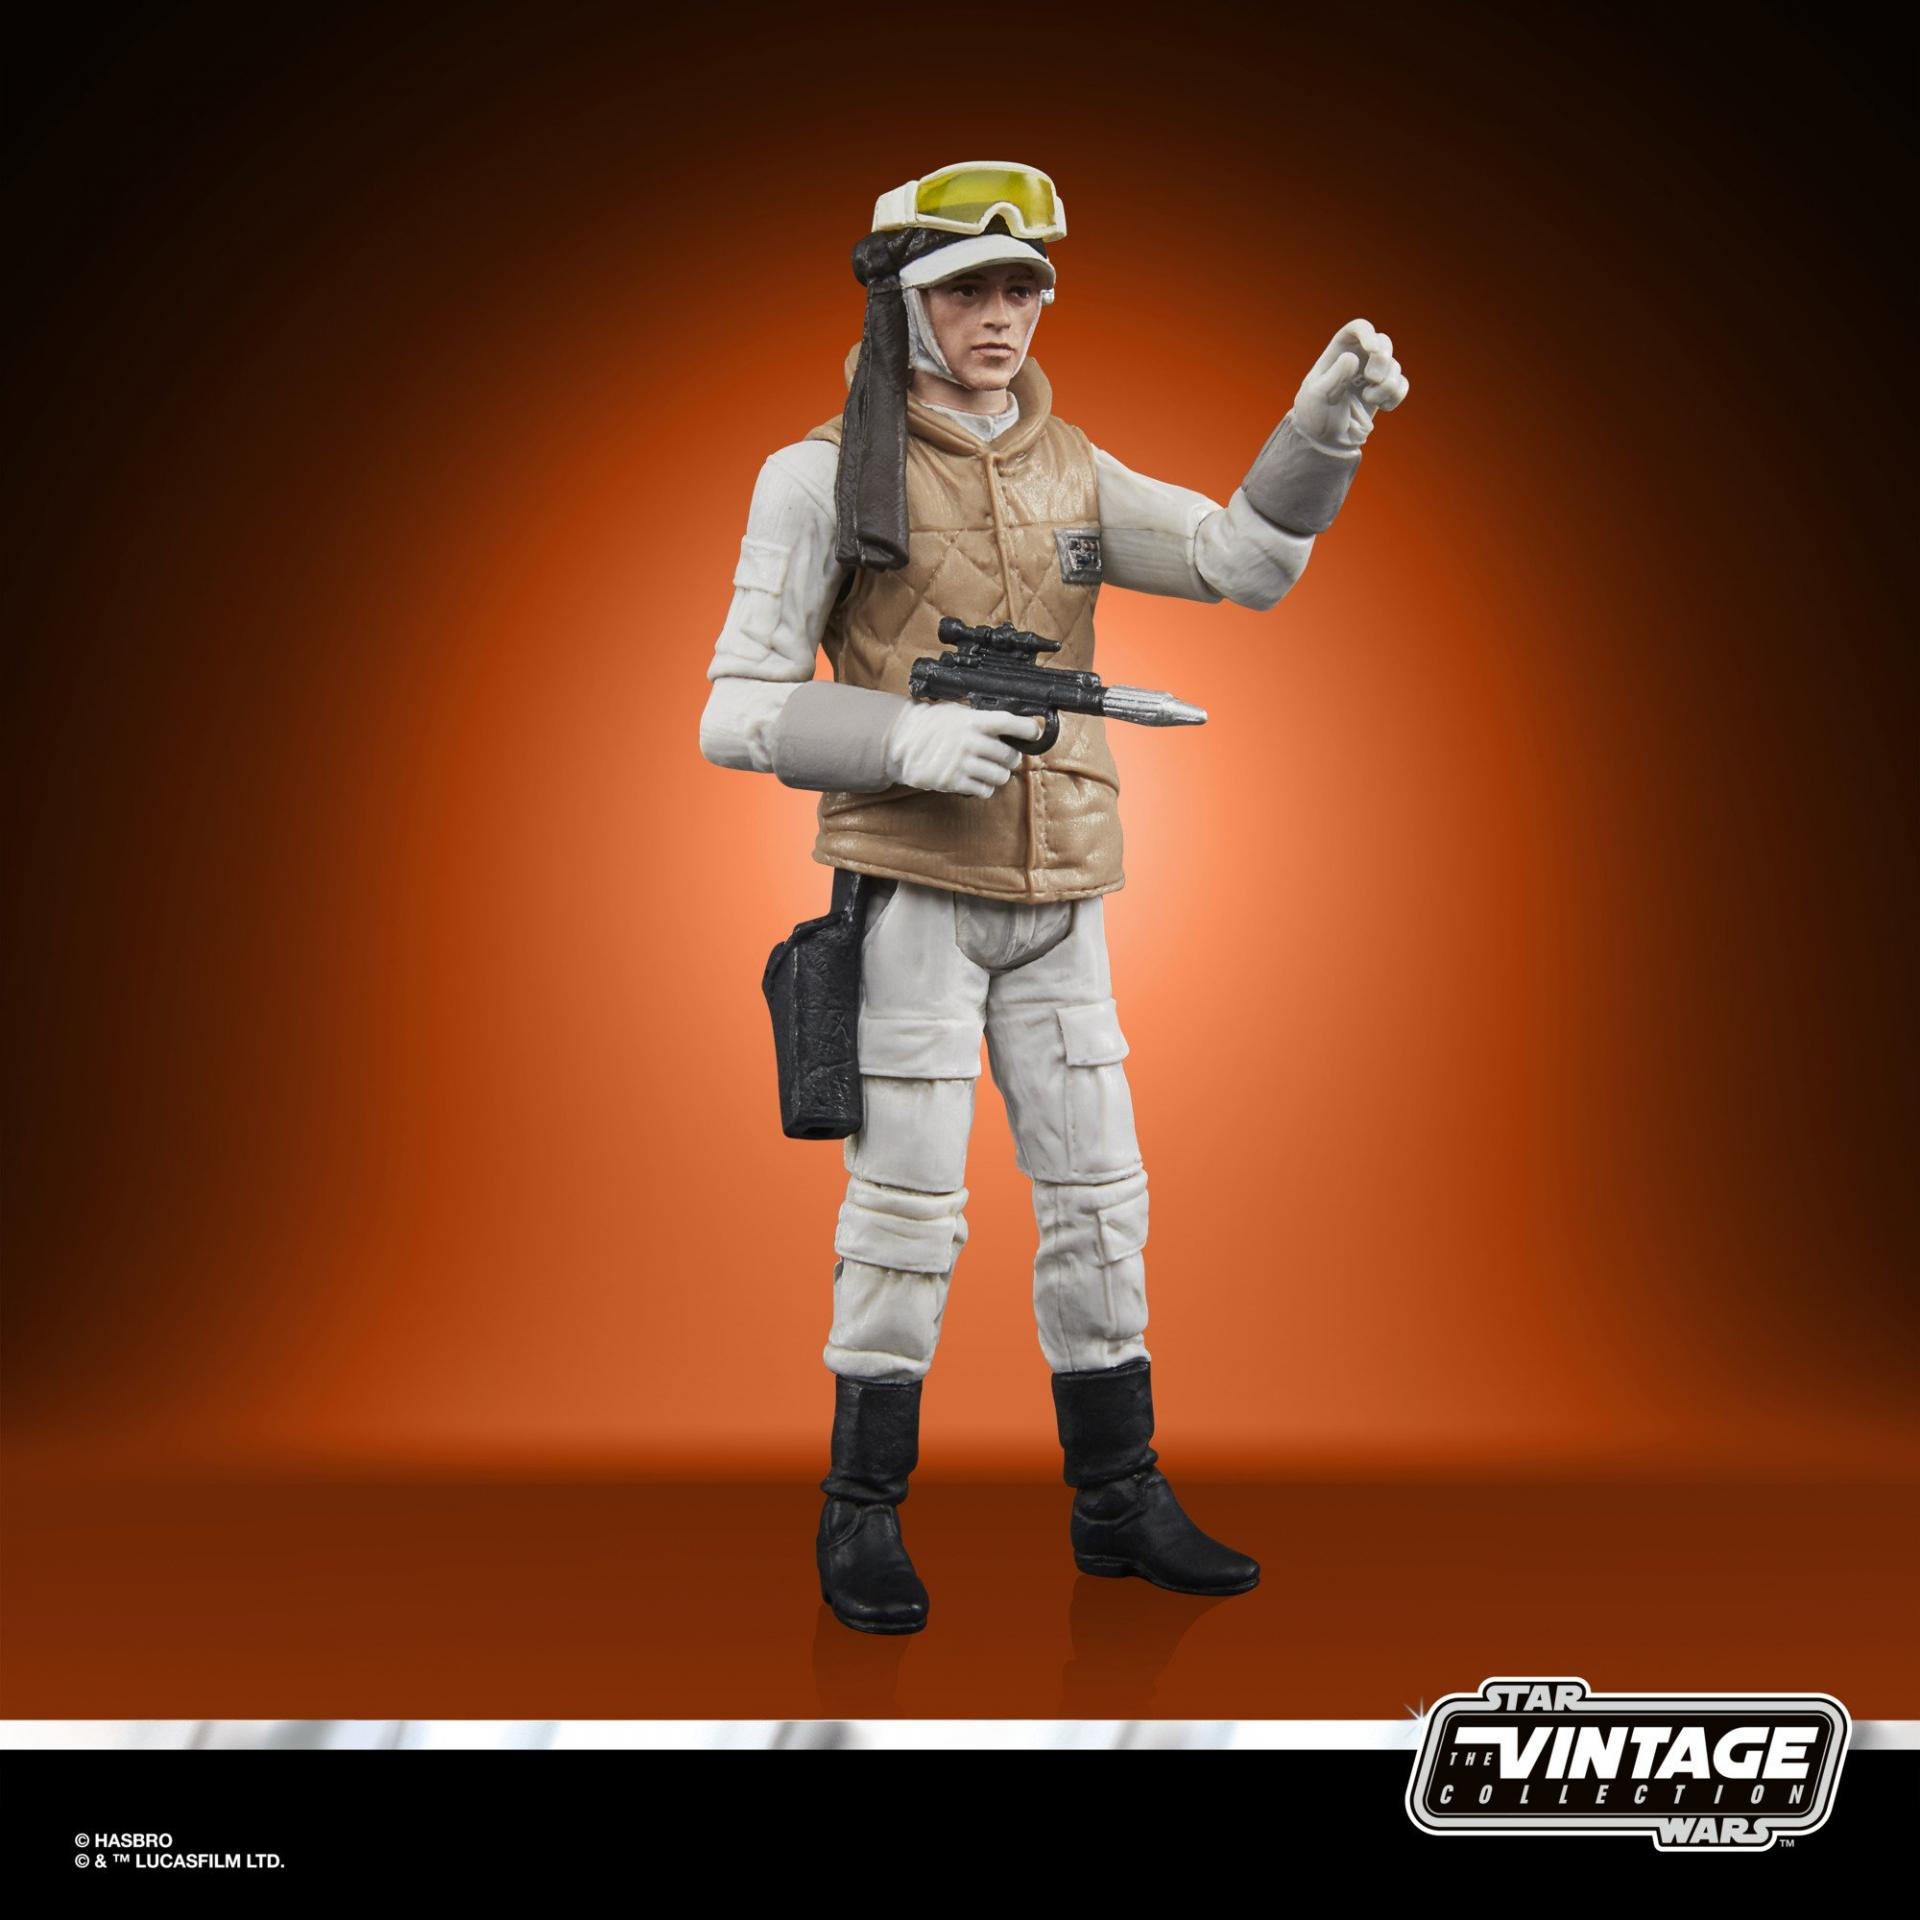 Star wars the vintage collection rebel soldier echo base battle gear 1